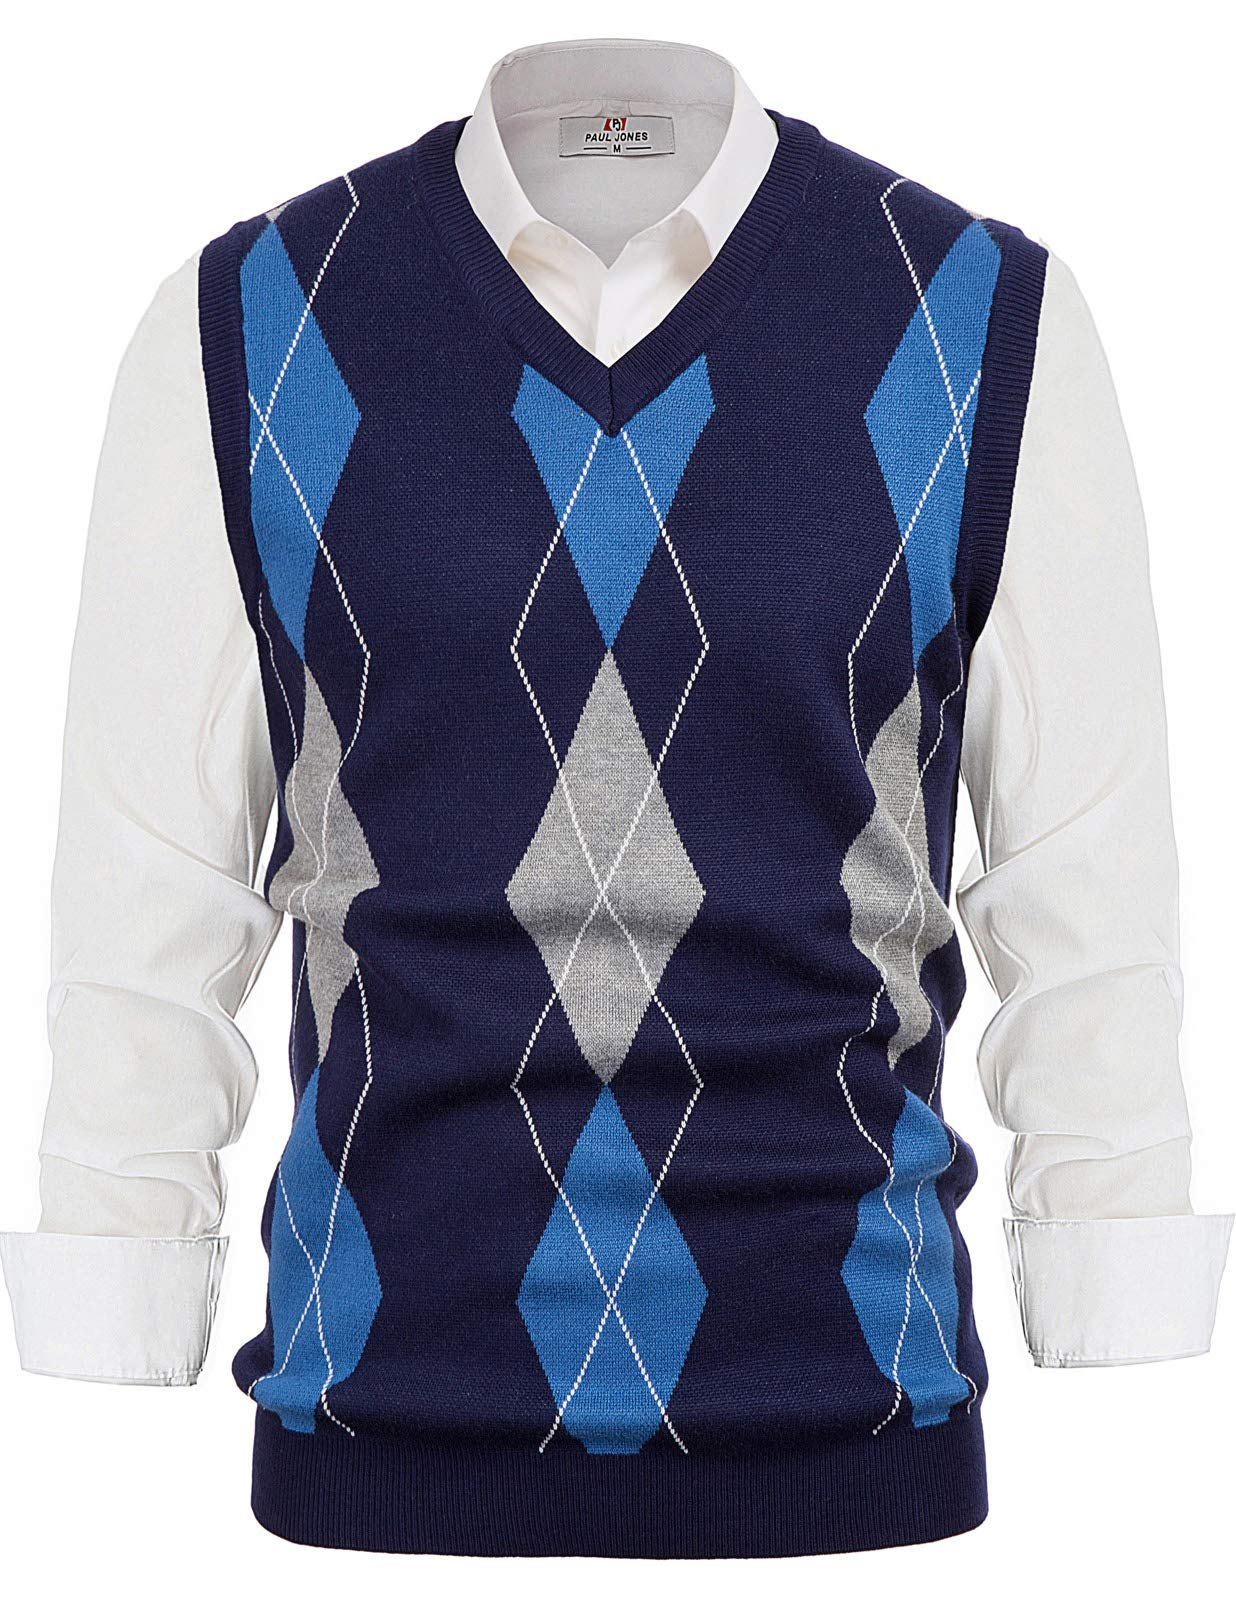 Men's Classic V-Neck Argyle Sweater Vest Lightweight Pullover Vest Navy, X-Large by PAUL JONES